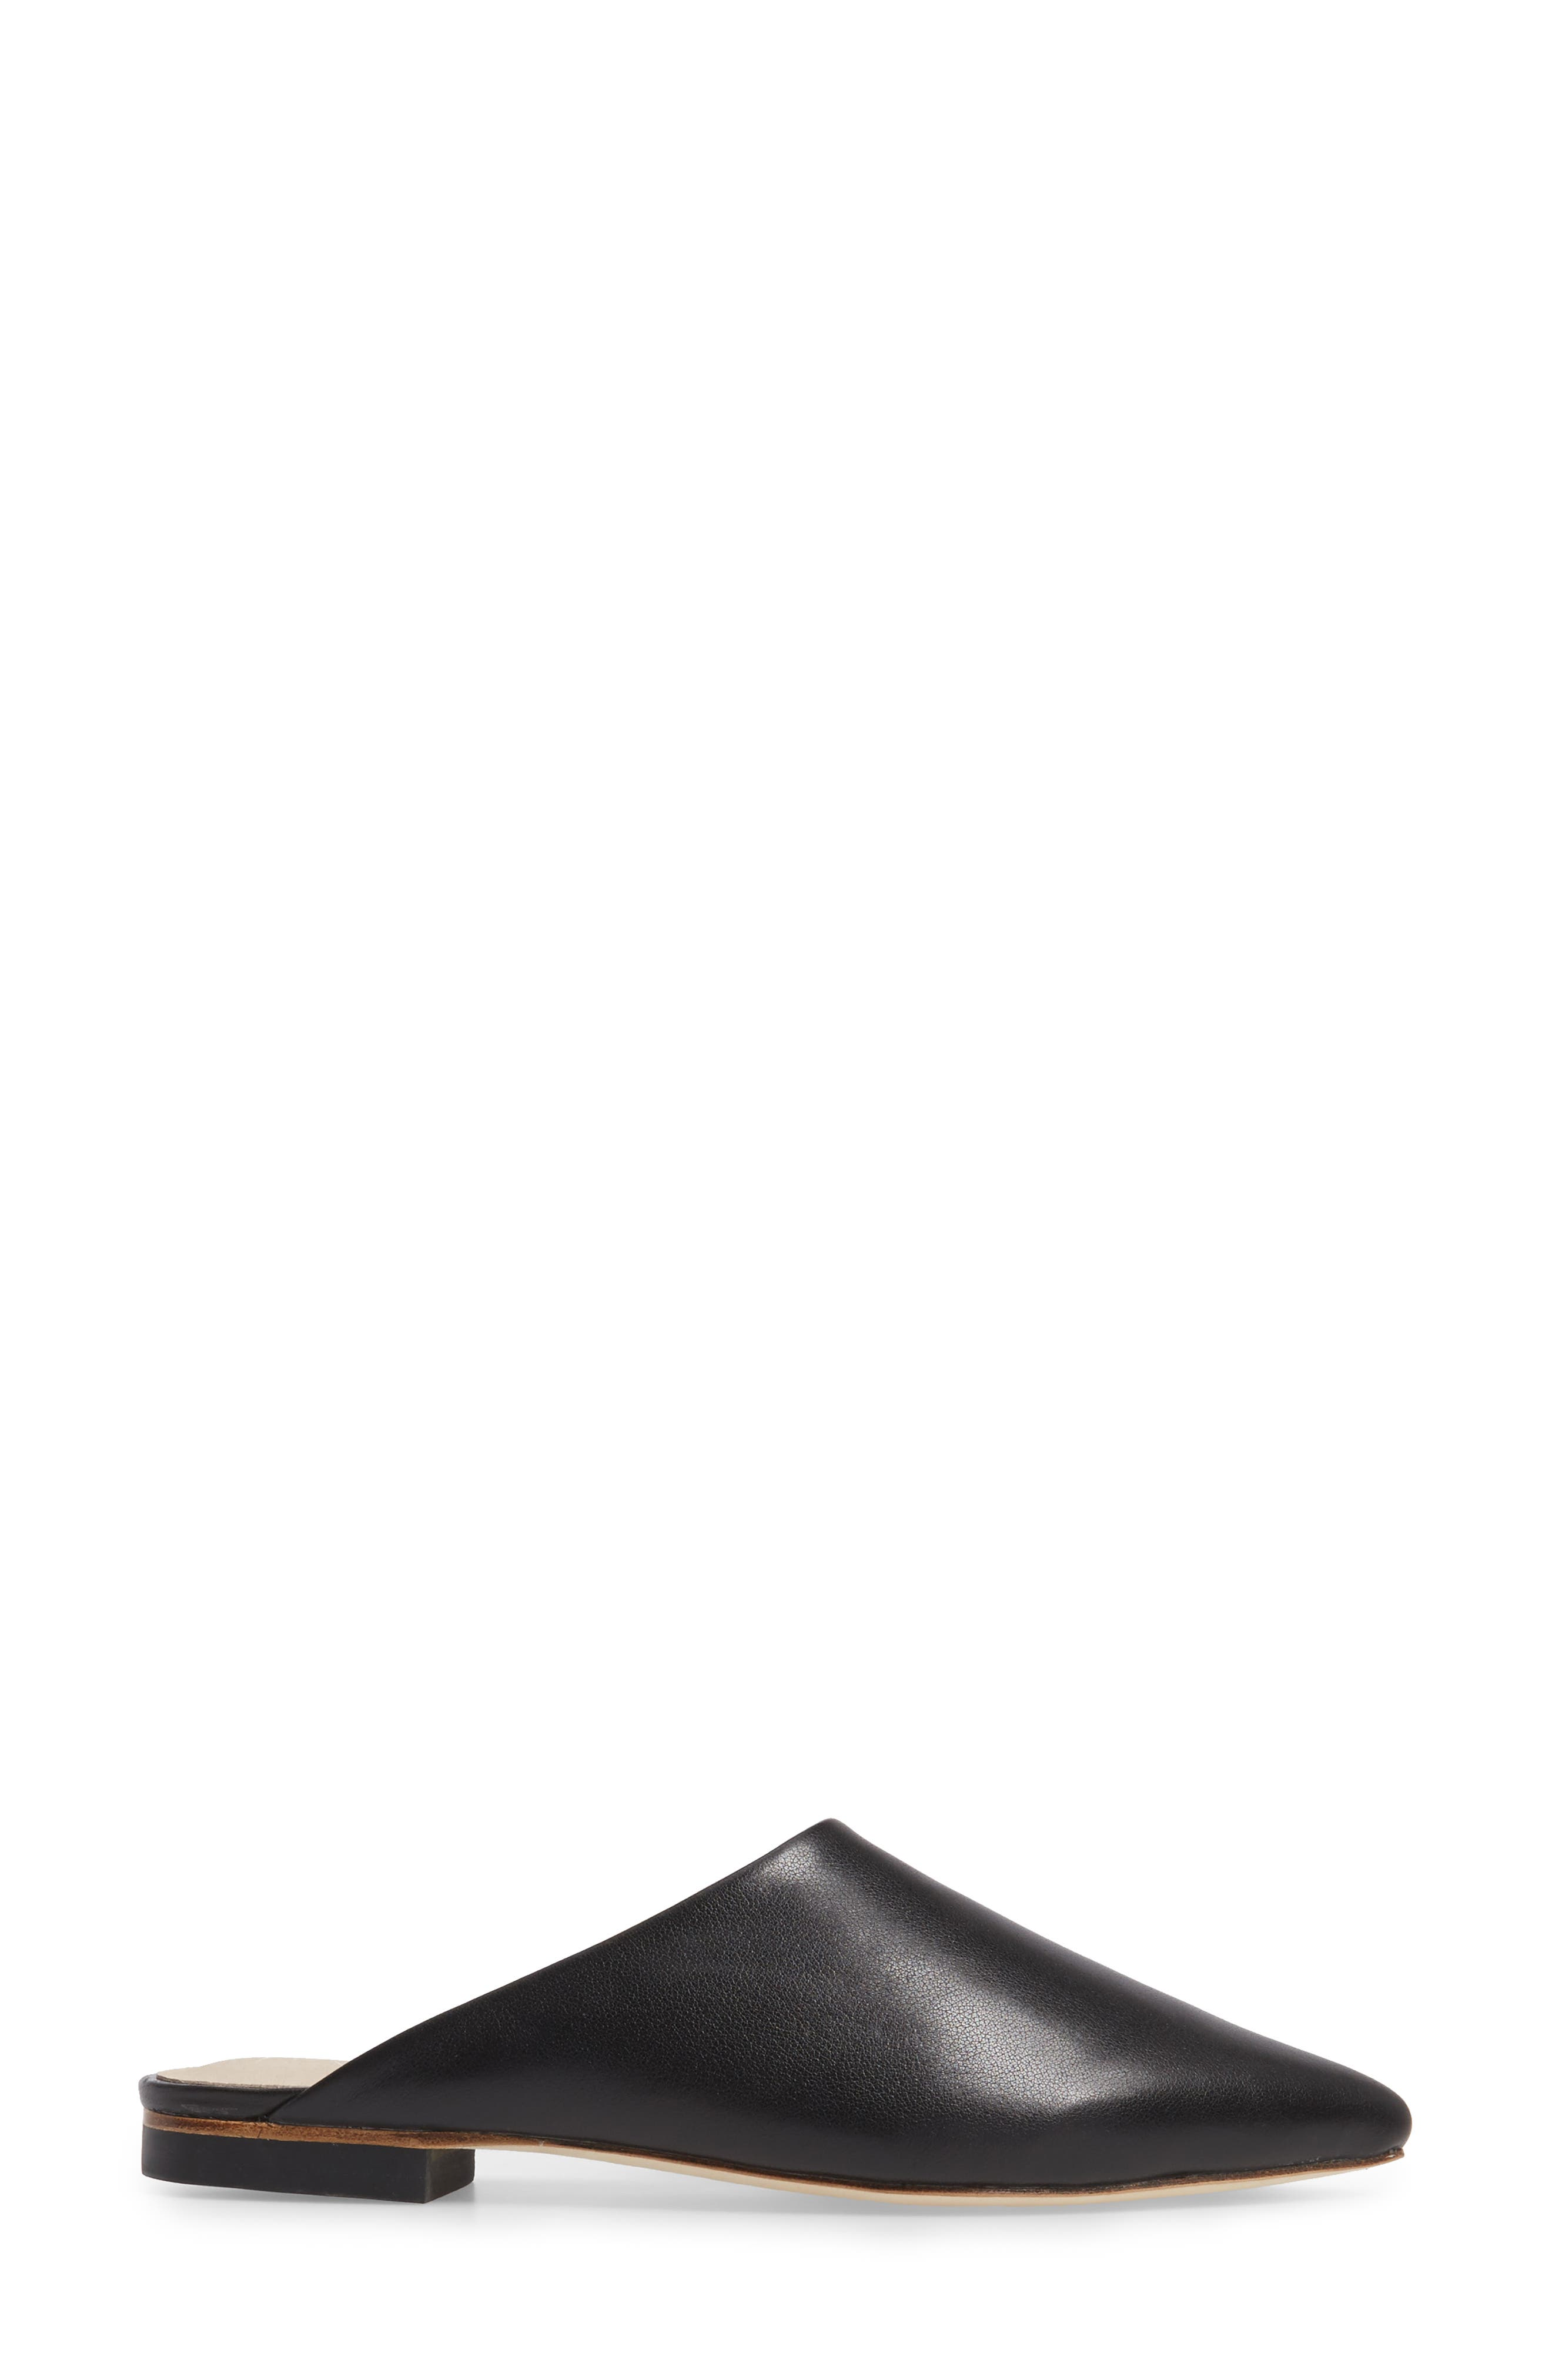 Starlet Mule,                             Alternate thumbnail 3, color,                             Black Leather